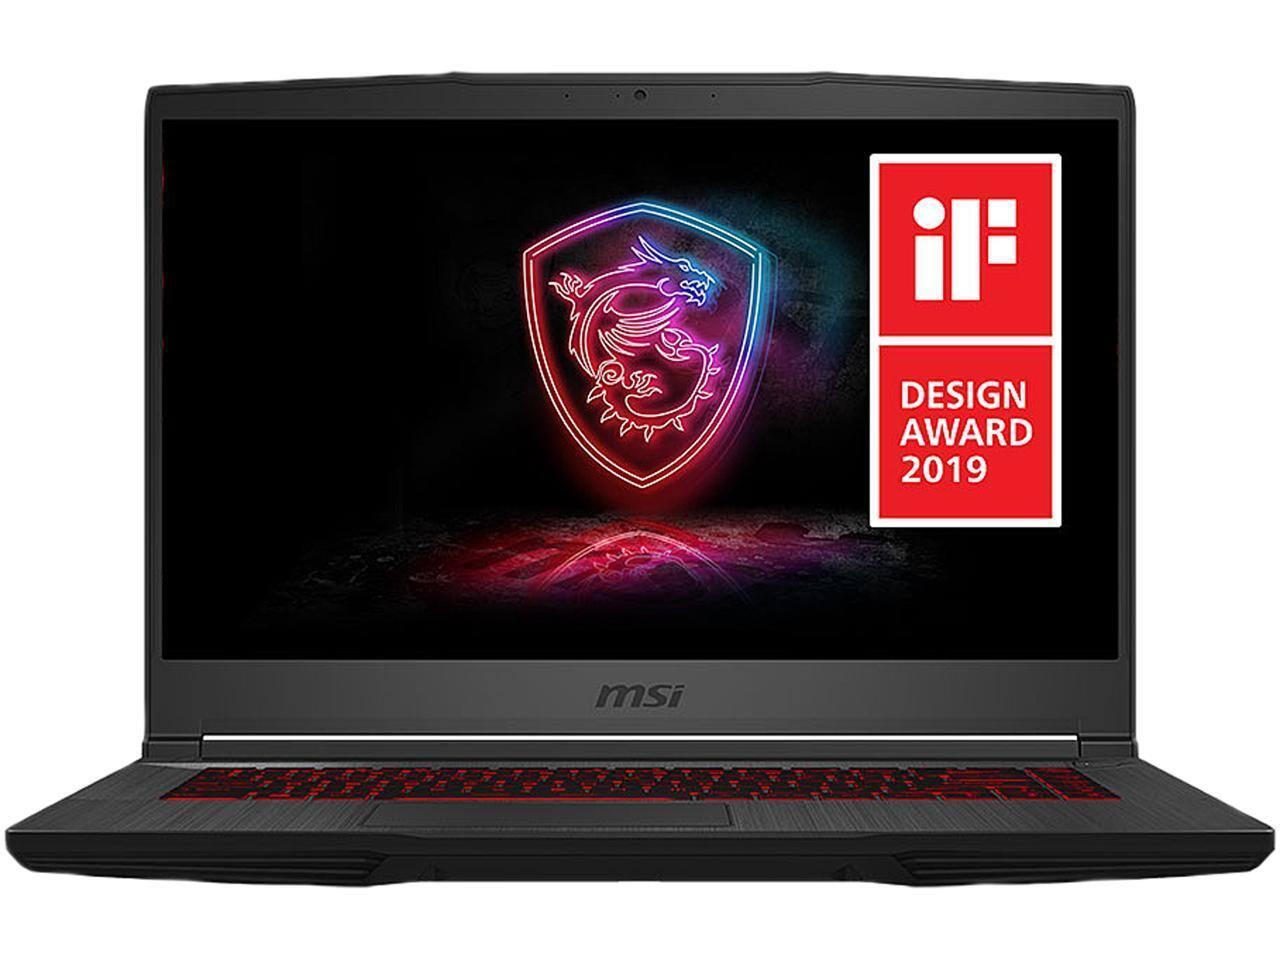 "MSI GF65 Thin 9SD-836 [15.6"" 144Hz, Intel Core i5-9300H, NVIDIA GeForce GTX 1660 Ti, 8GB RAM, 256GB SSD] Gaming Laptop plus $100 MIR for $799 + F/S"